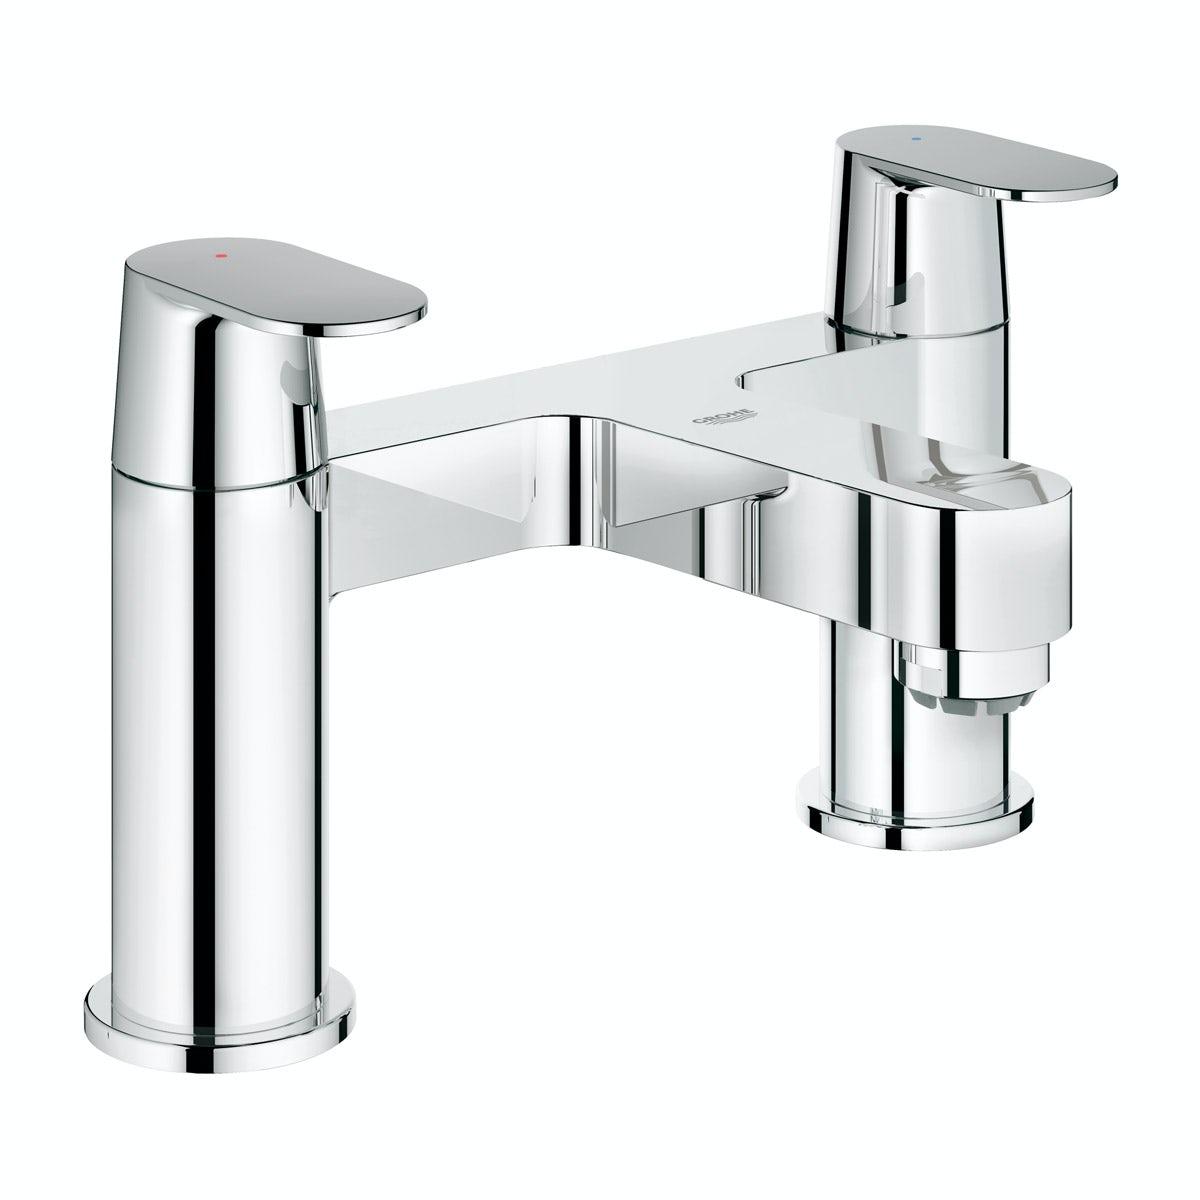 Grohe Eurosmart Cosmopolitan bath mixer tap